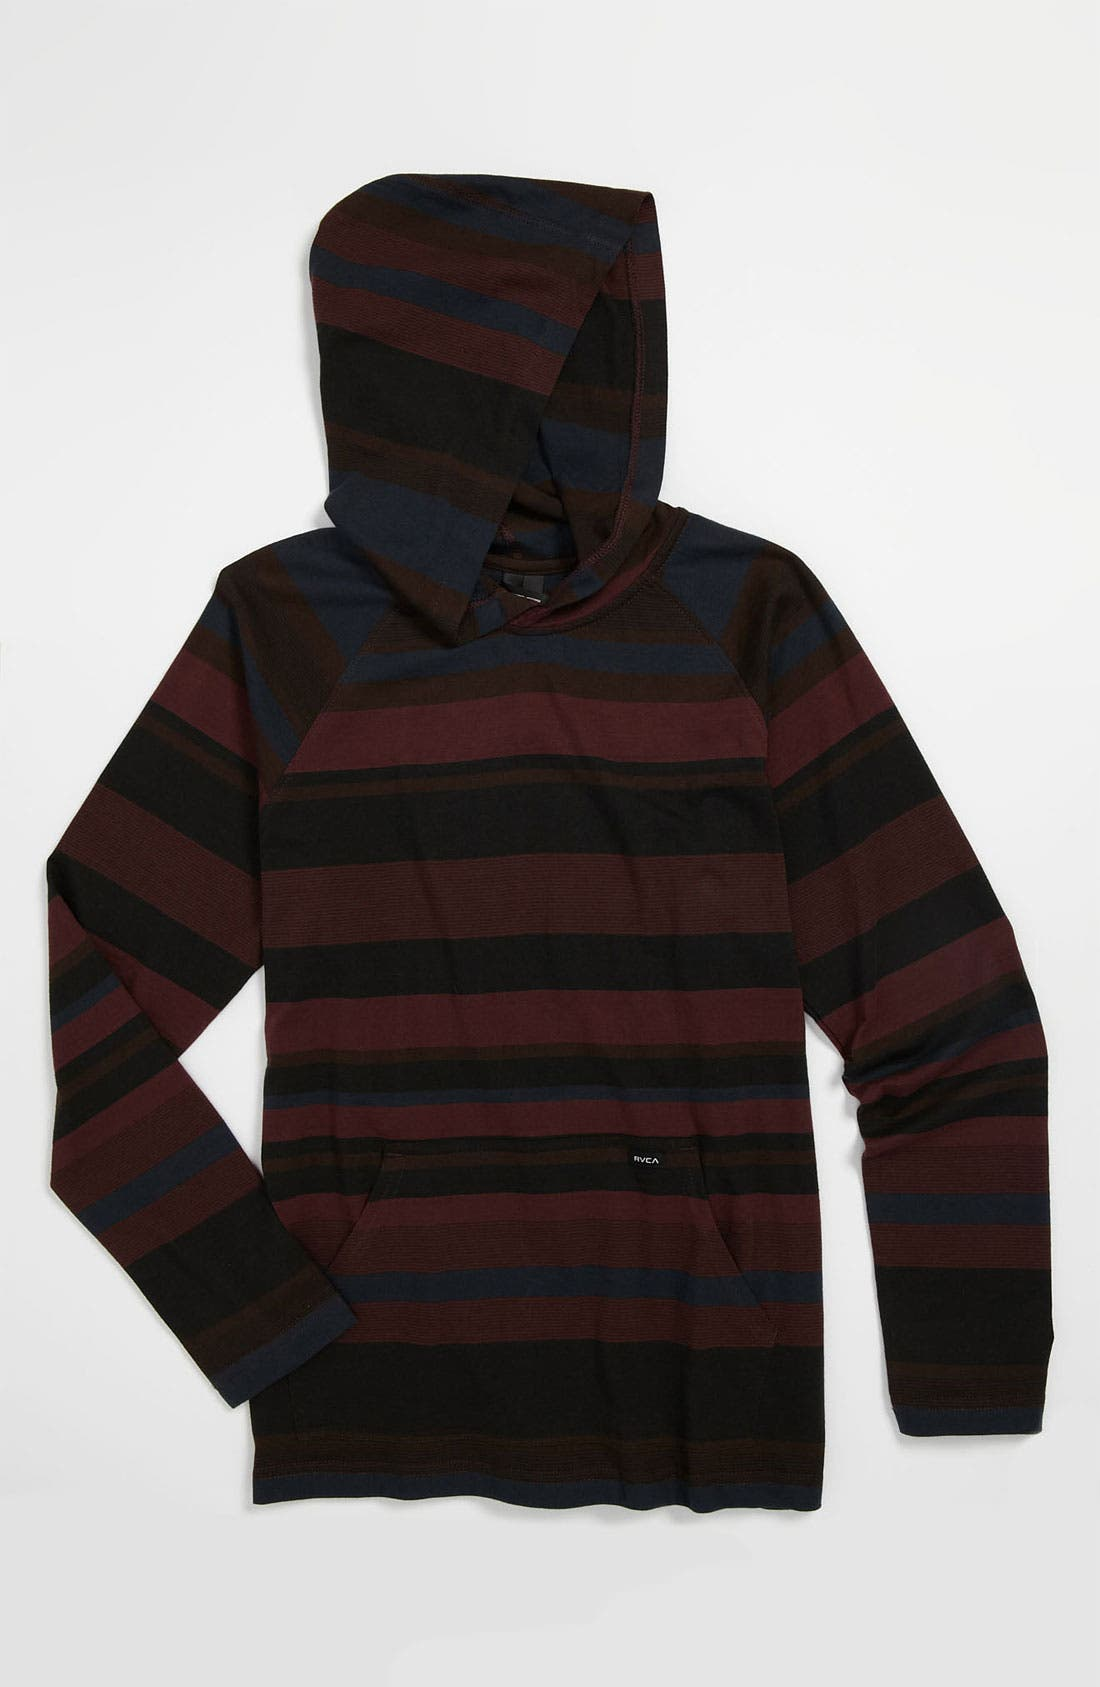 Main Image - RVCA 'Adirondak' Hooded Knit Shirt (Big Boys)